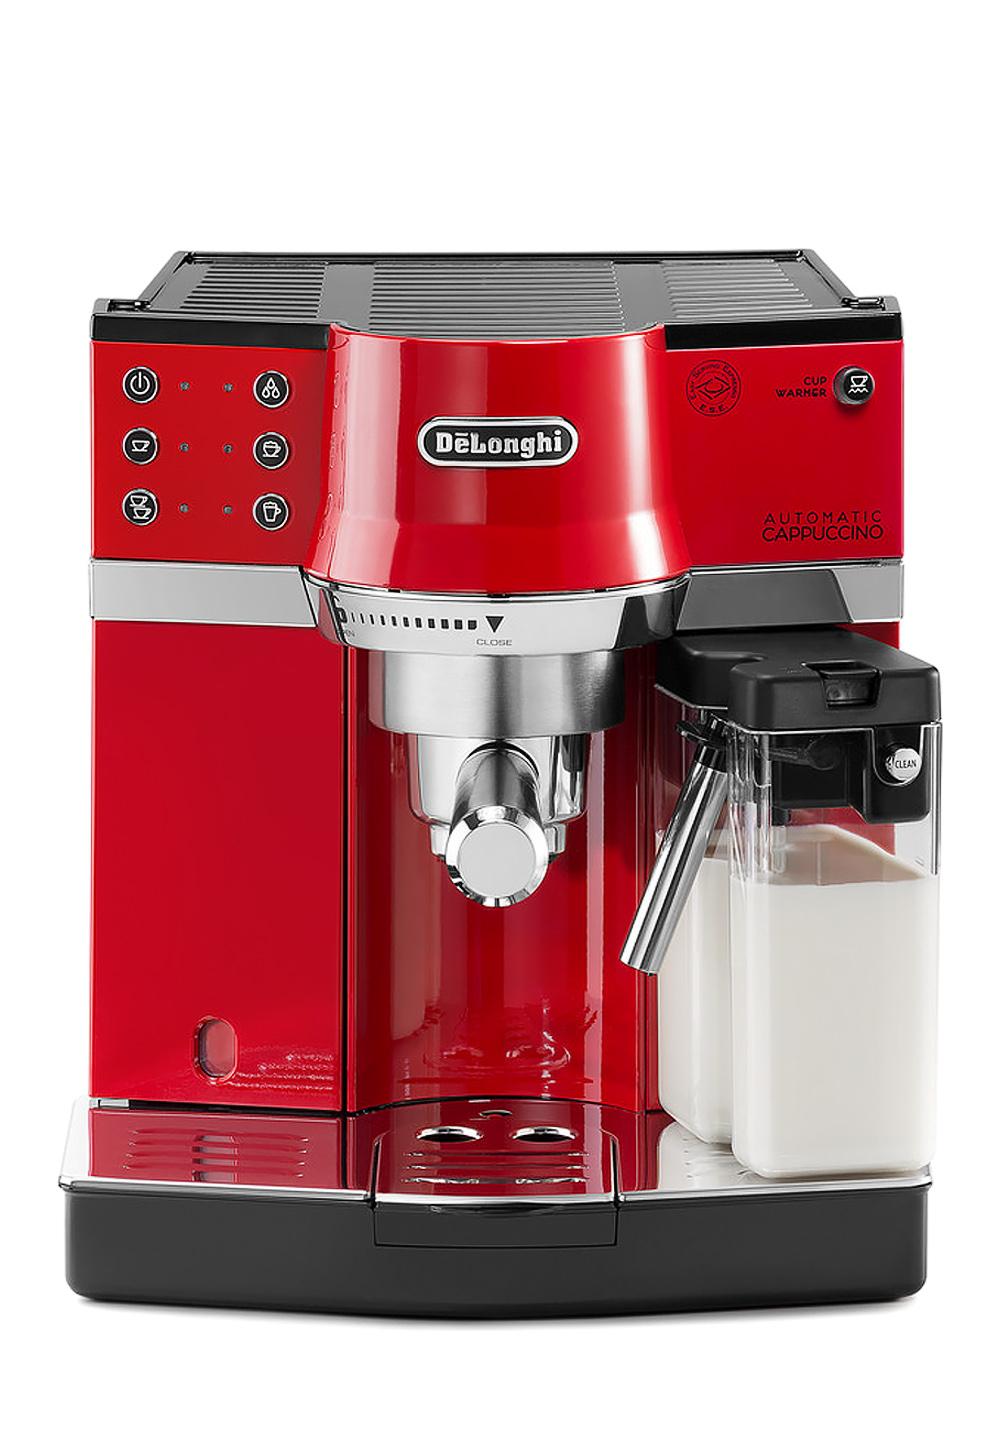 Espresso-Siebträgermaschine De'Longhi EC 860 (1450W, 15 bar, Kaffeepulver oder E.S.E.-Pads, Milchaufschäumsystem, Wasserfilter)